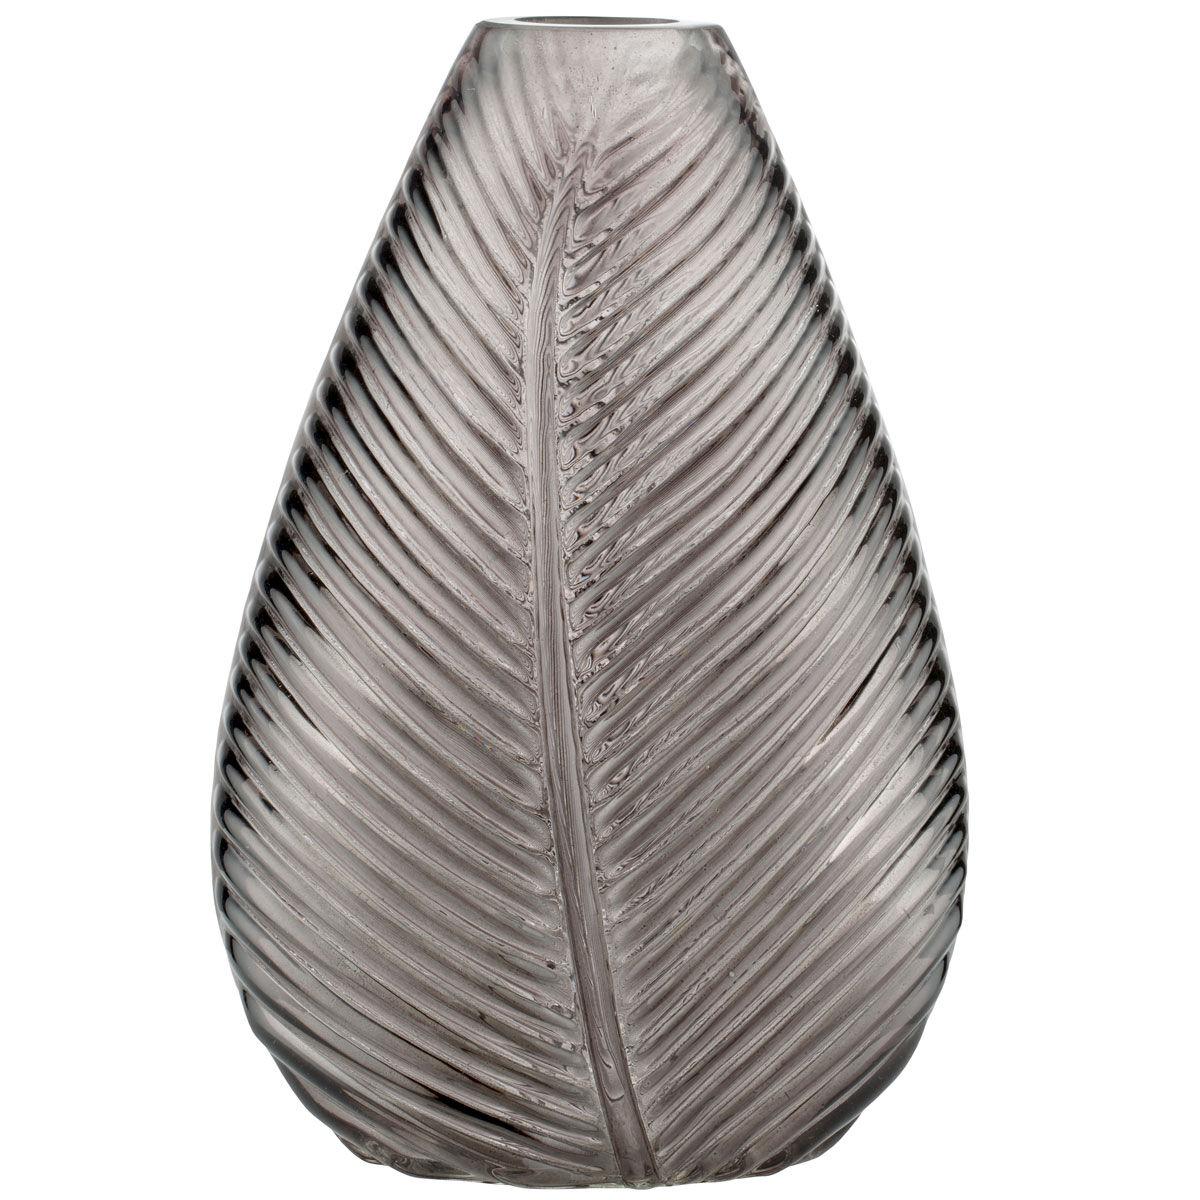 Lene Bjerre Misa Vase 23 cm, Peat